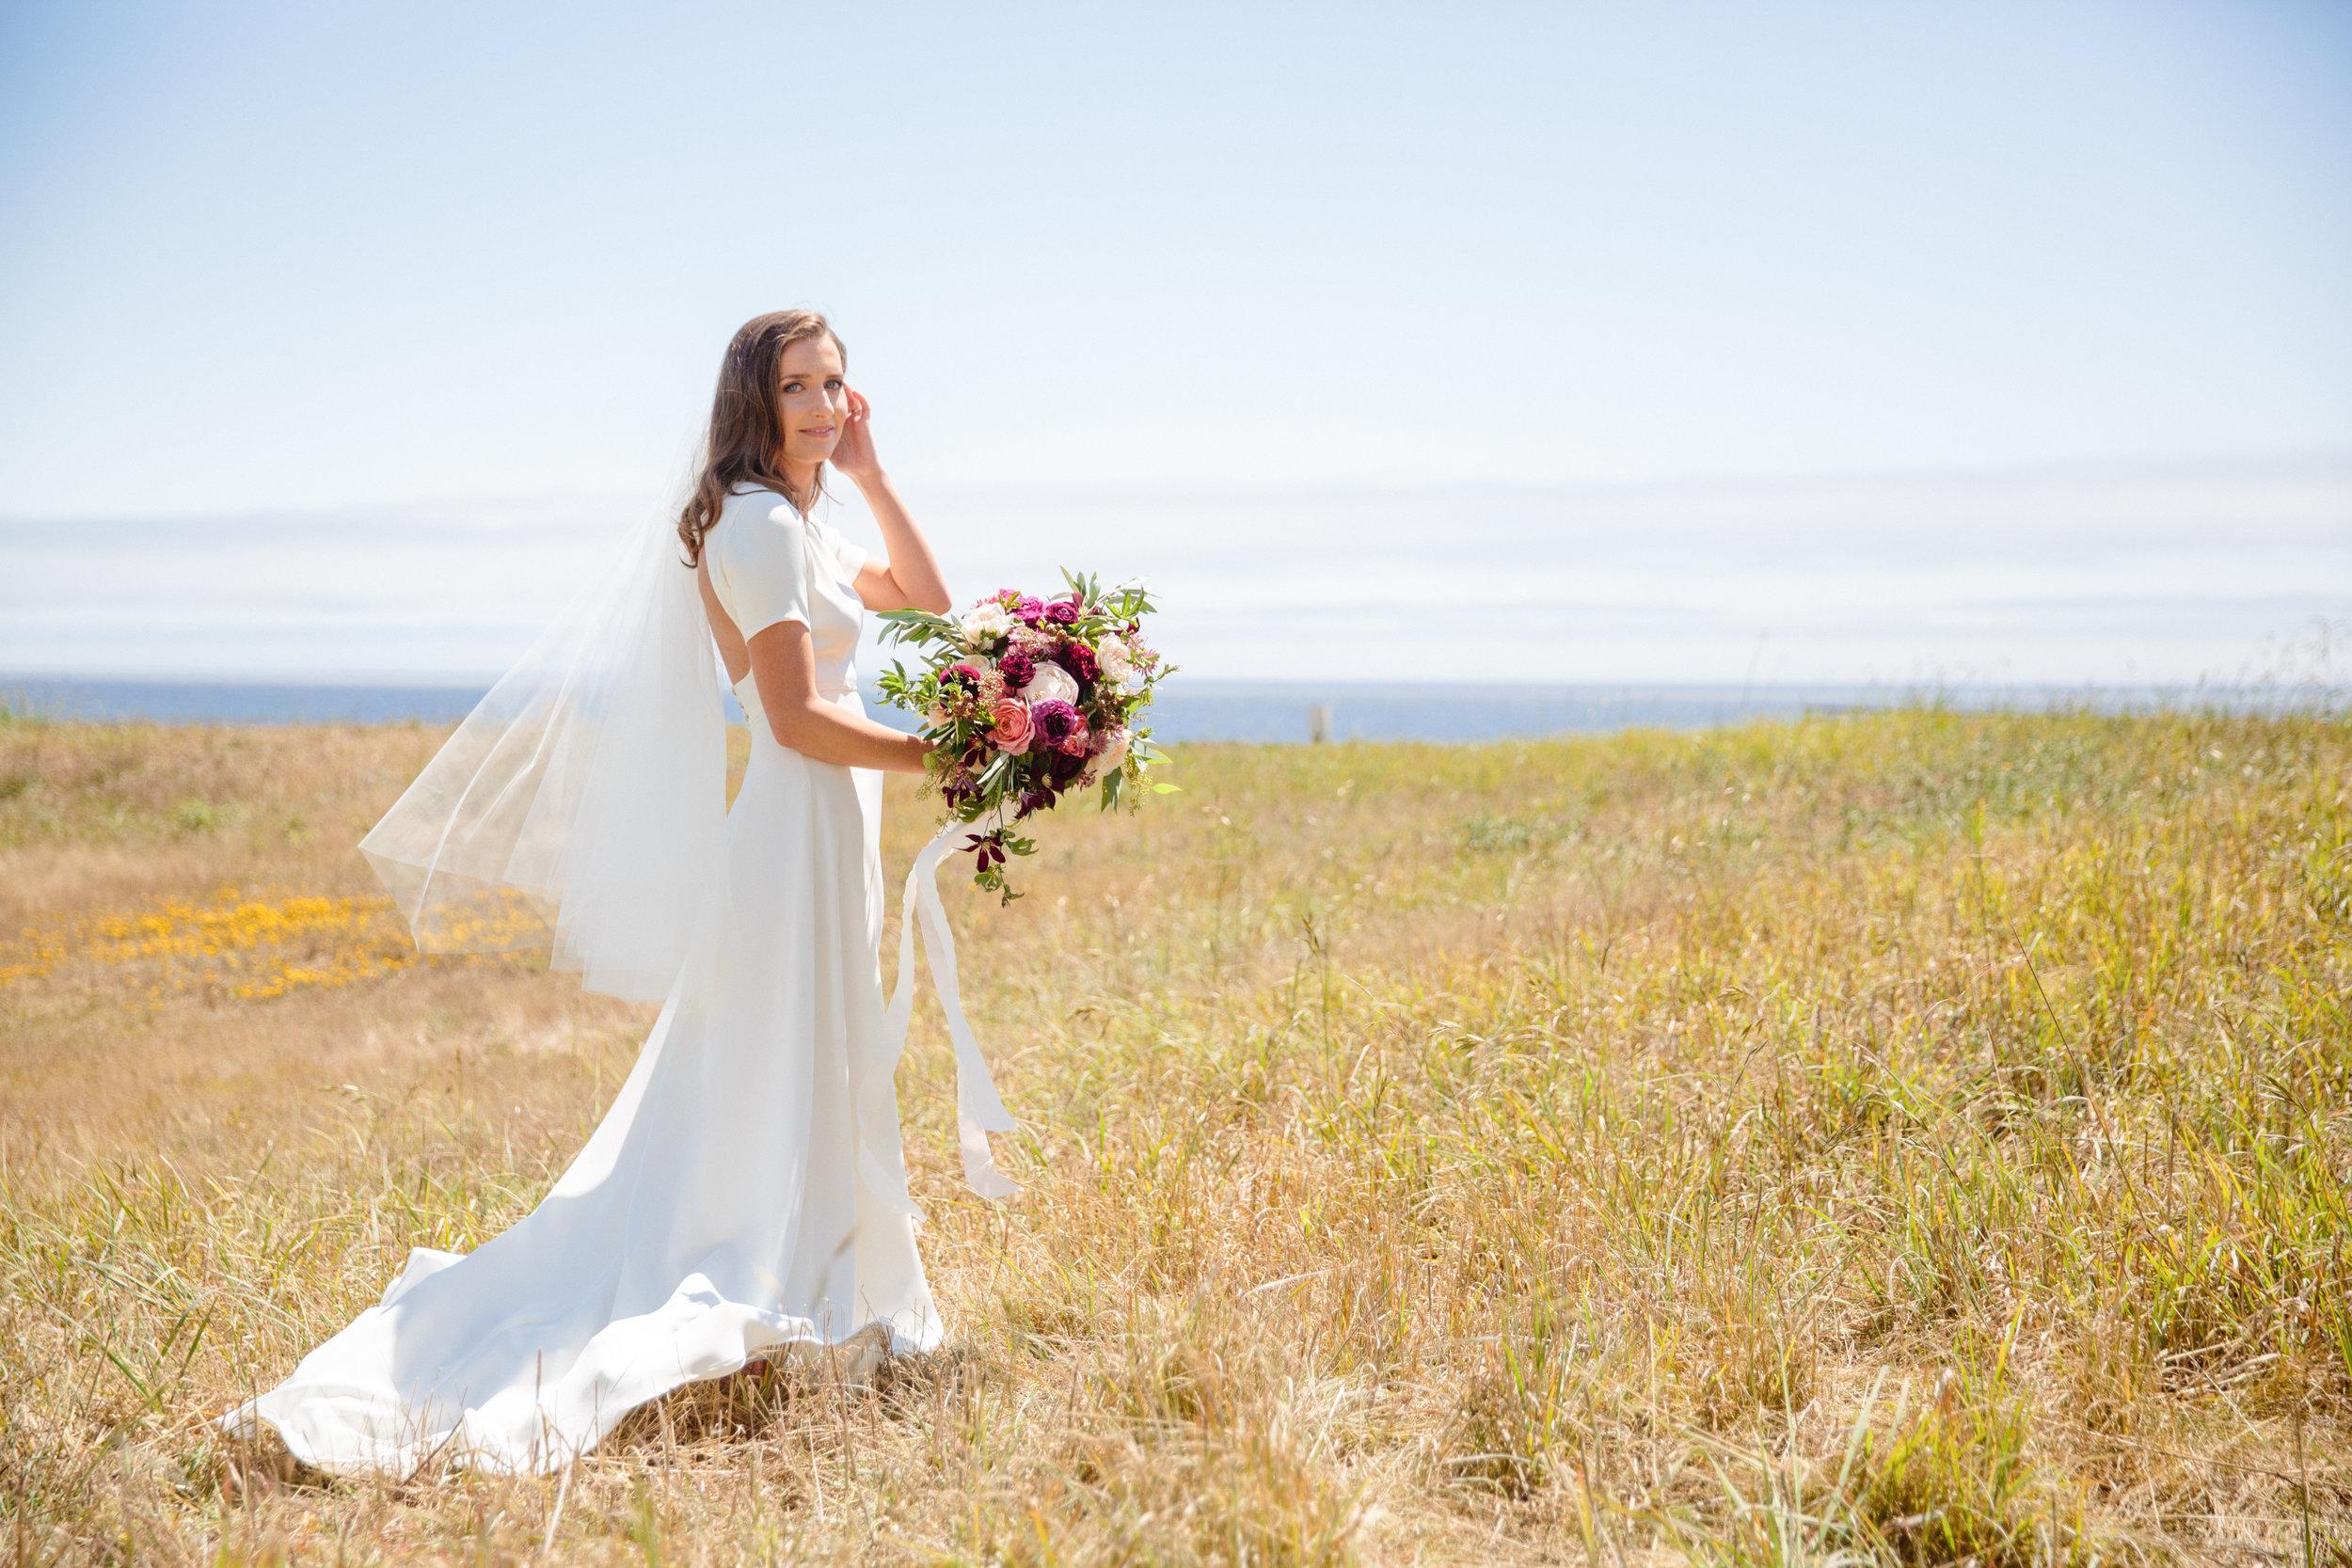 larissa-cleveland-sivanjeremy-wedding-0230-2.jpg